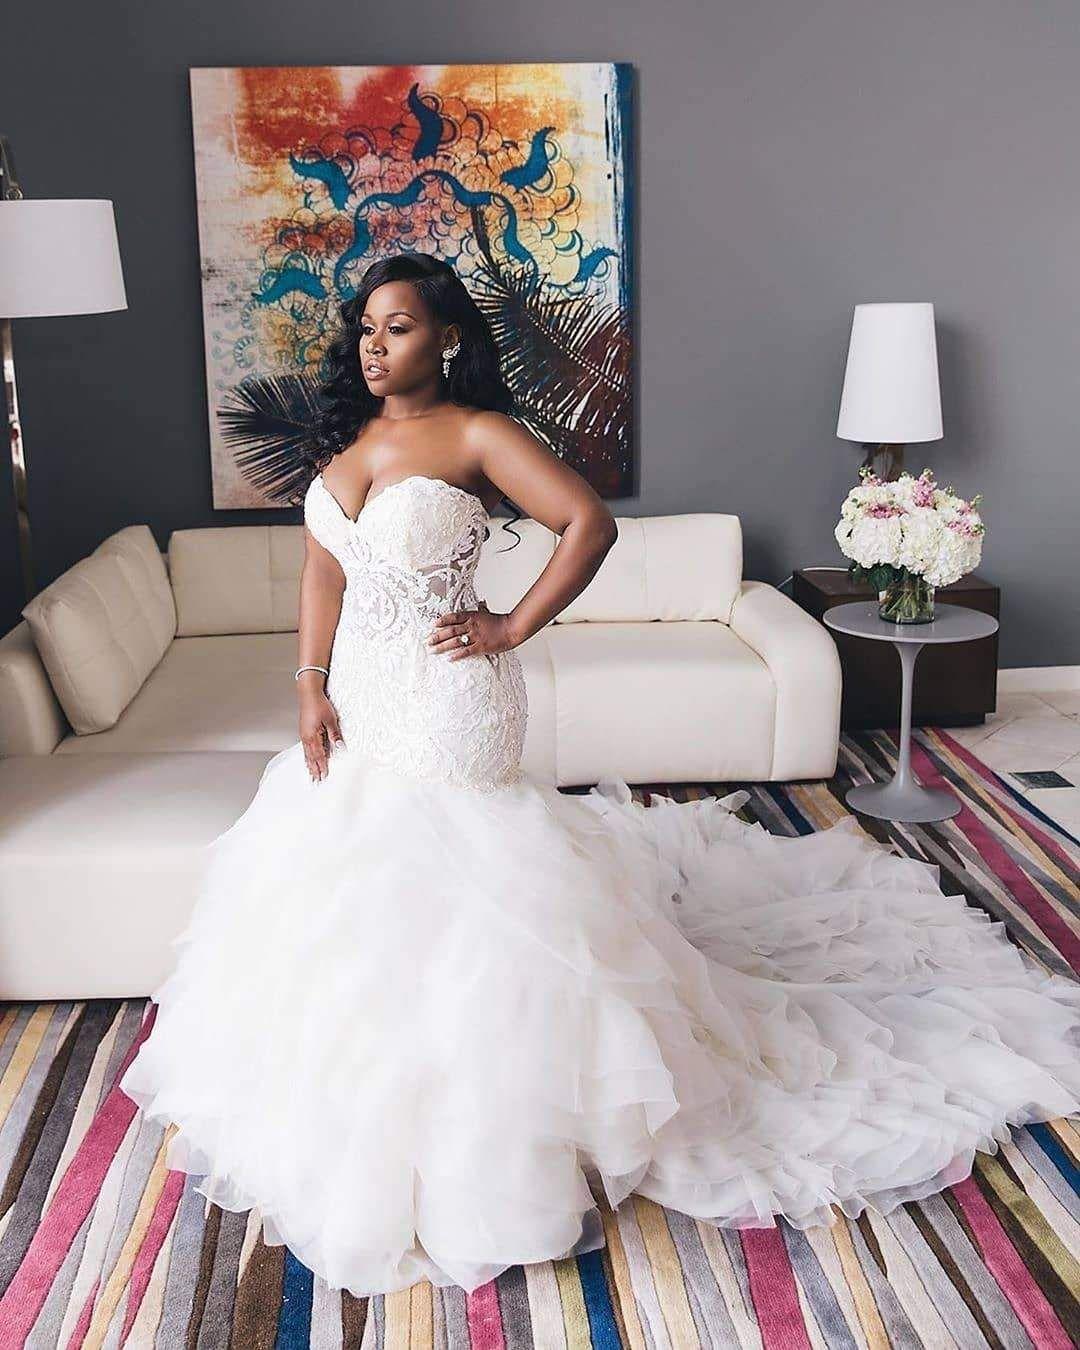 Trumpet Mermaid Wedding Dress Sweetheart Lace Beaded Bridal Gown Jka021 Wedding Dresses Mermaid Sweetheart Lace Sweetheart Wedding Dress Mermaid Wedding Dress [ 1350 x 1080 Pixel ]